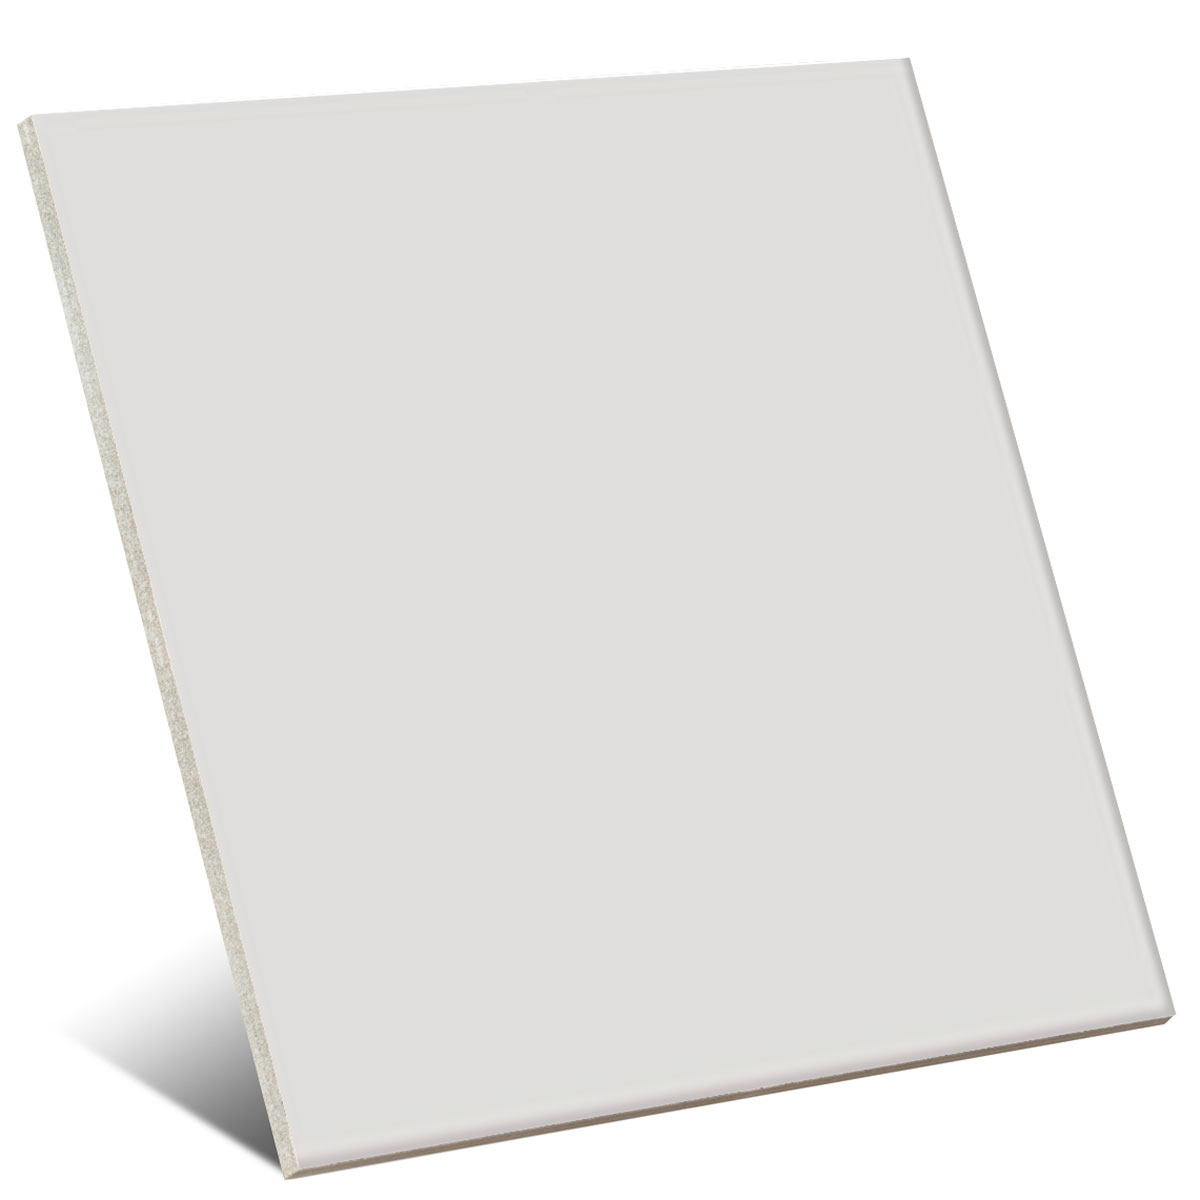 Color Gris Brillo 20x20 cm (caja 1 m2)